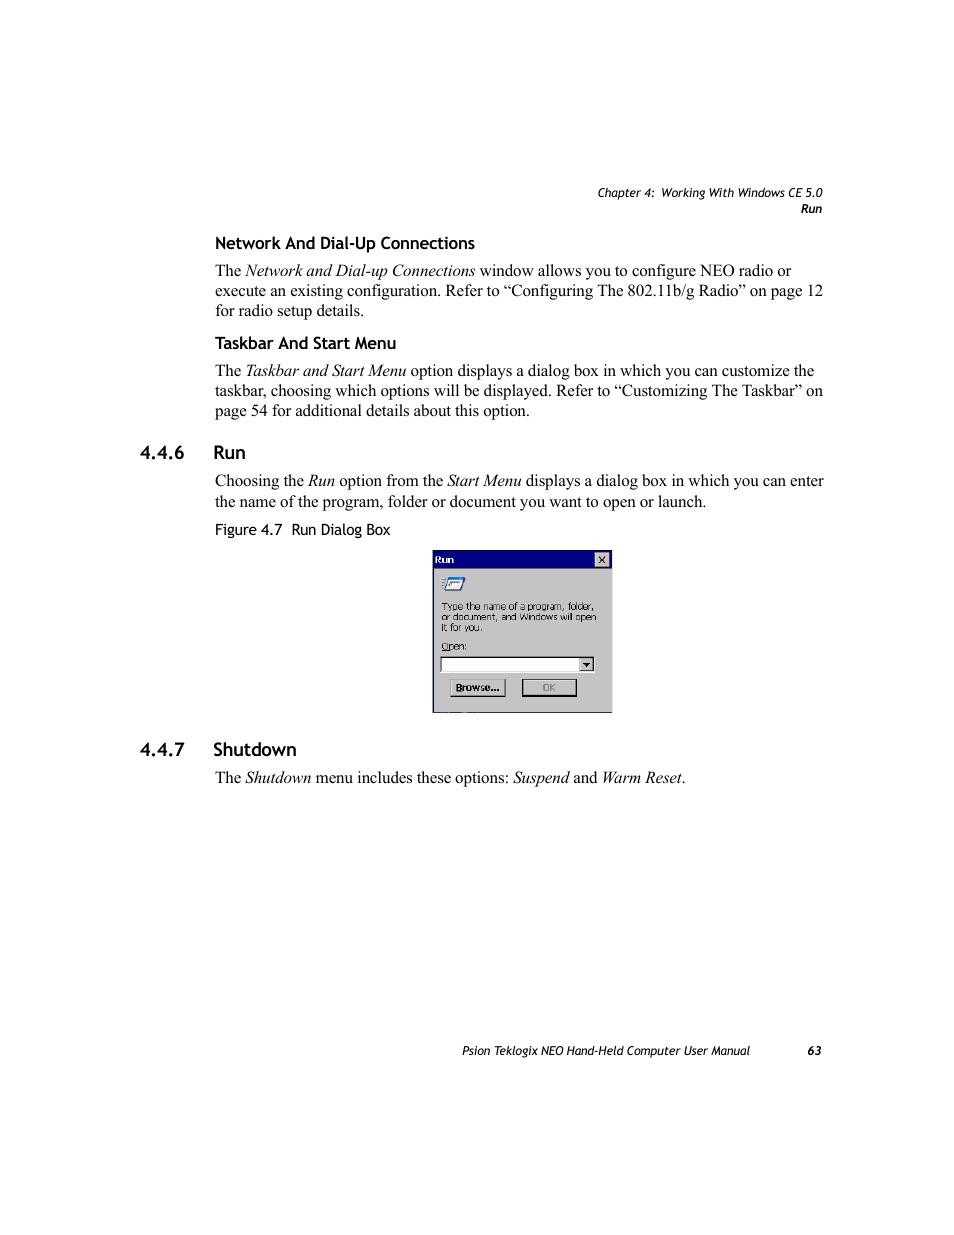 6 run, 7 shutdown, Shutdown   Psion Teklogix NEO PX750 User Manual   Page  75 / 238